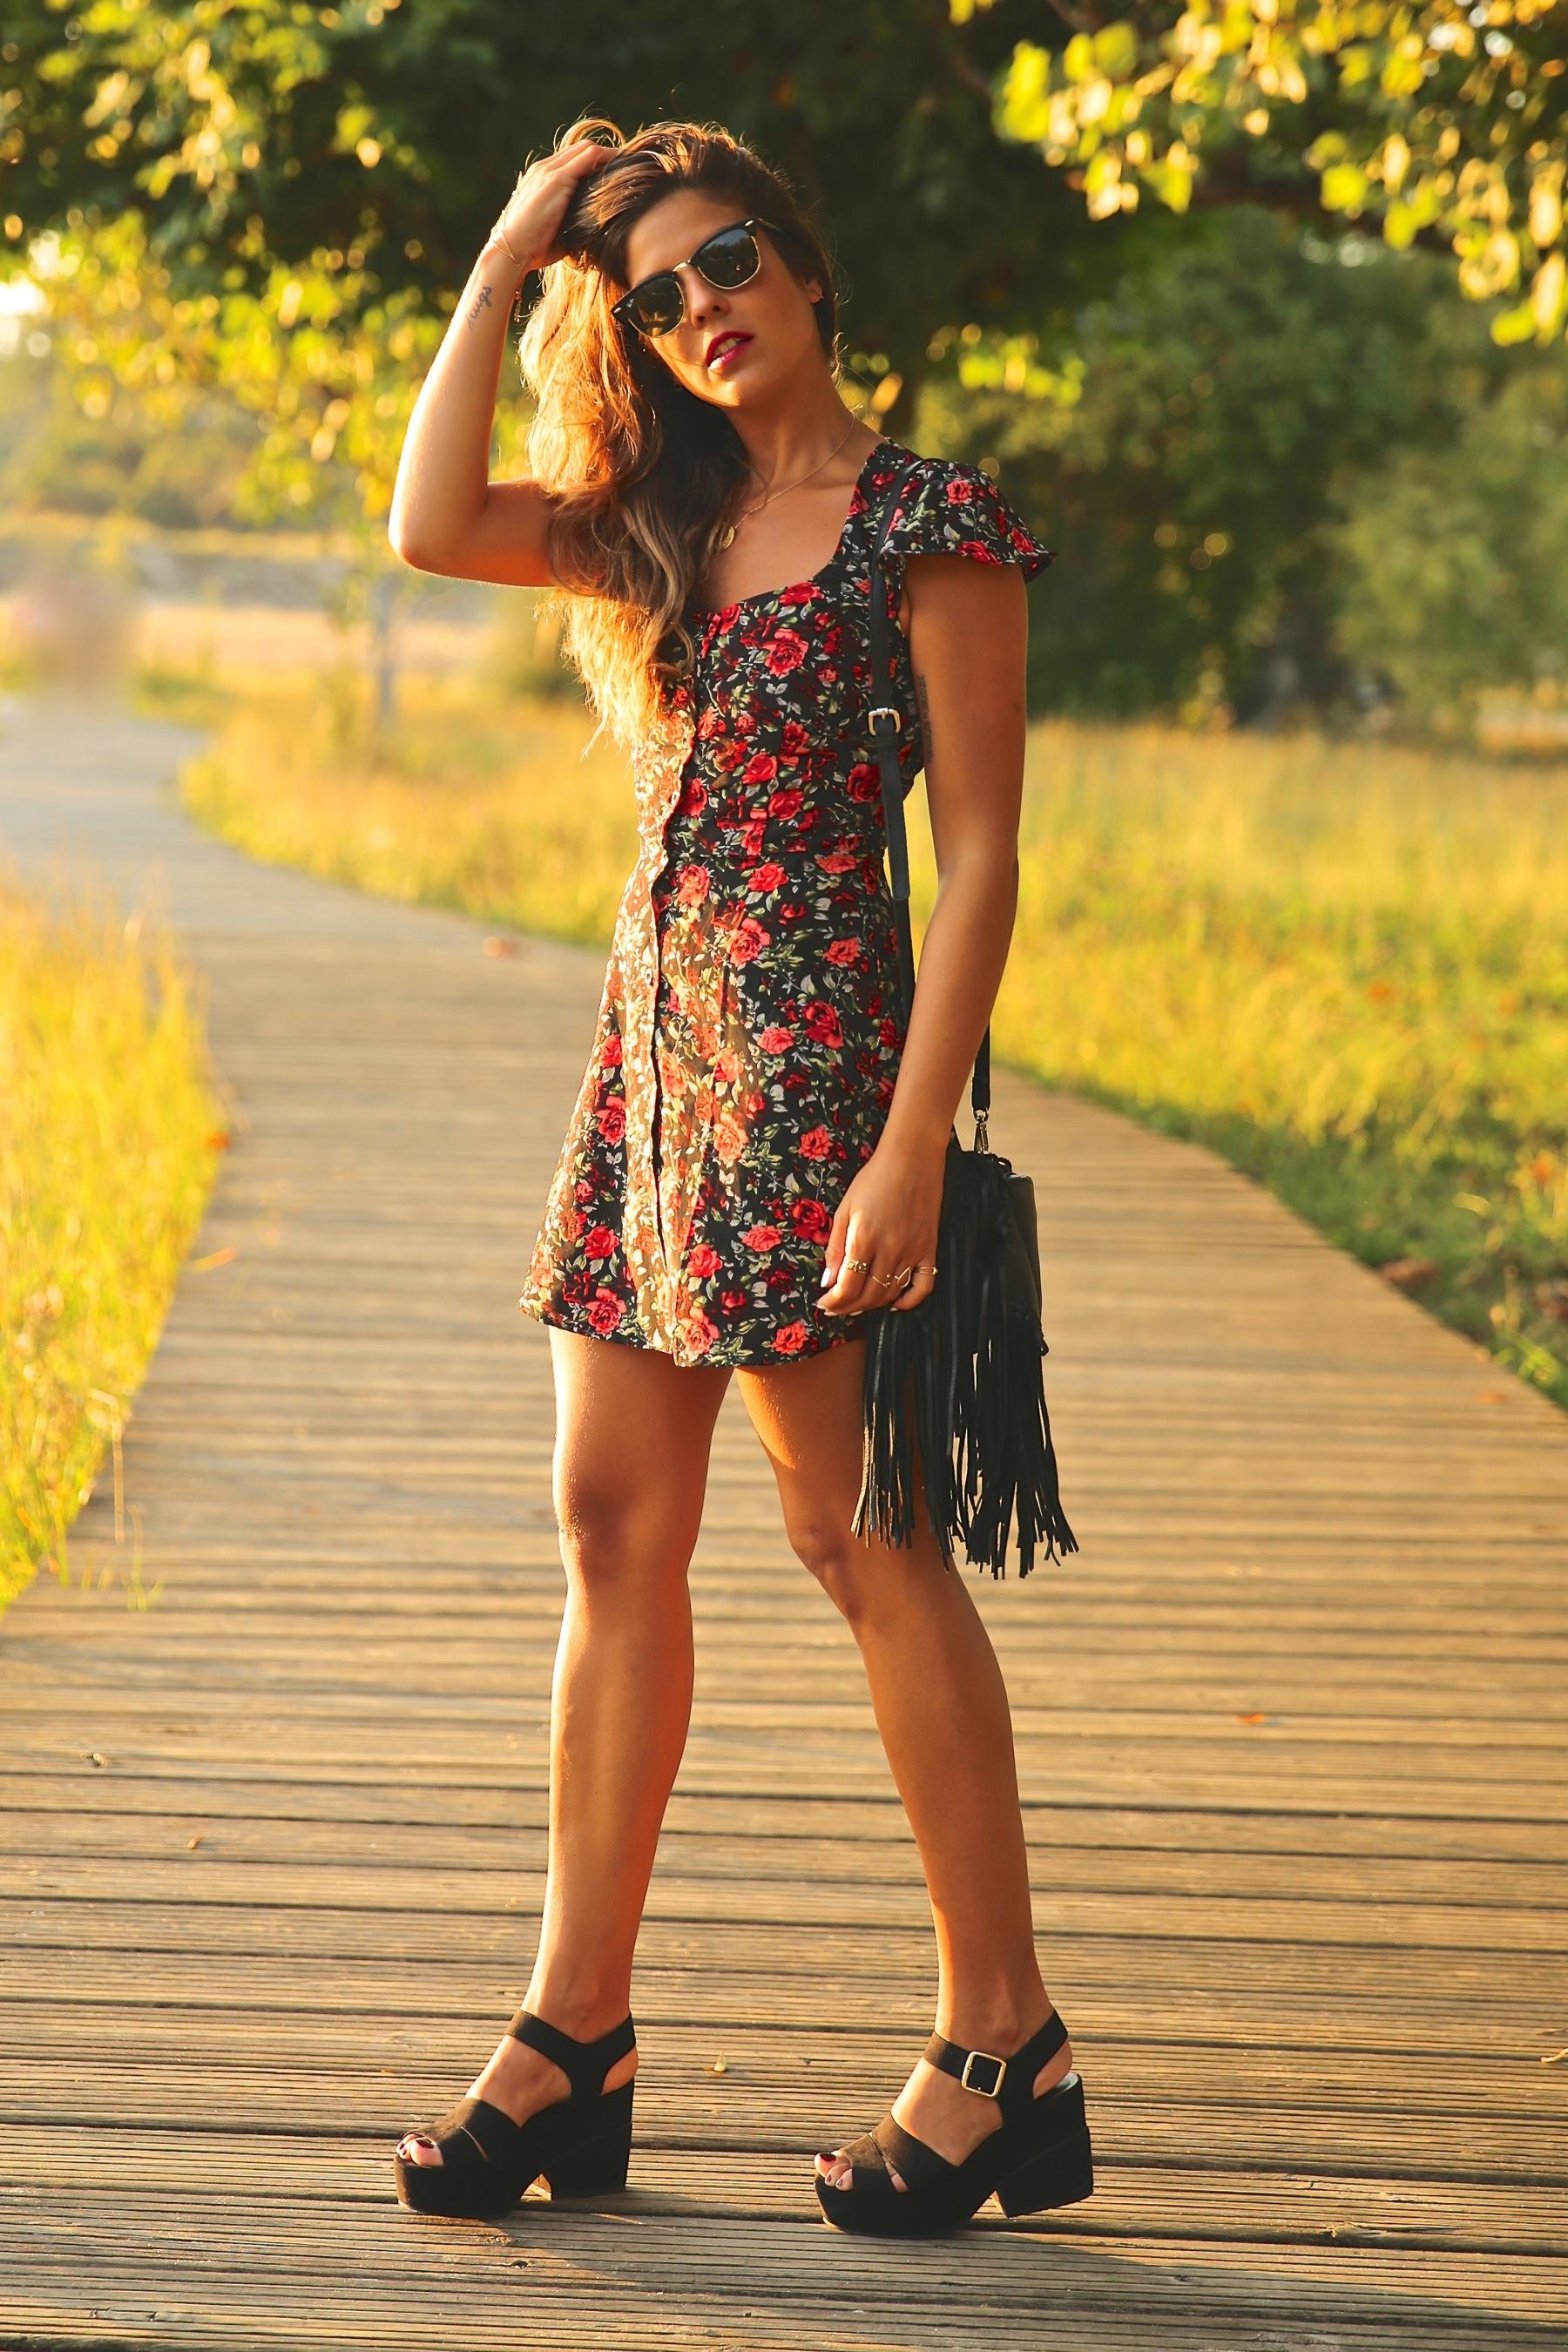 trendy_taste-look-outfit-street_style-ootd-blog-blogger-fashion_spain-moda_españa-flower_print-dress-vestido-flores-sandalias_negras-black_sandals-platforms-sunset-playa-beach-summer-14